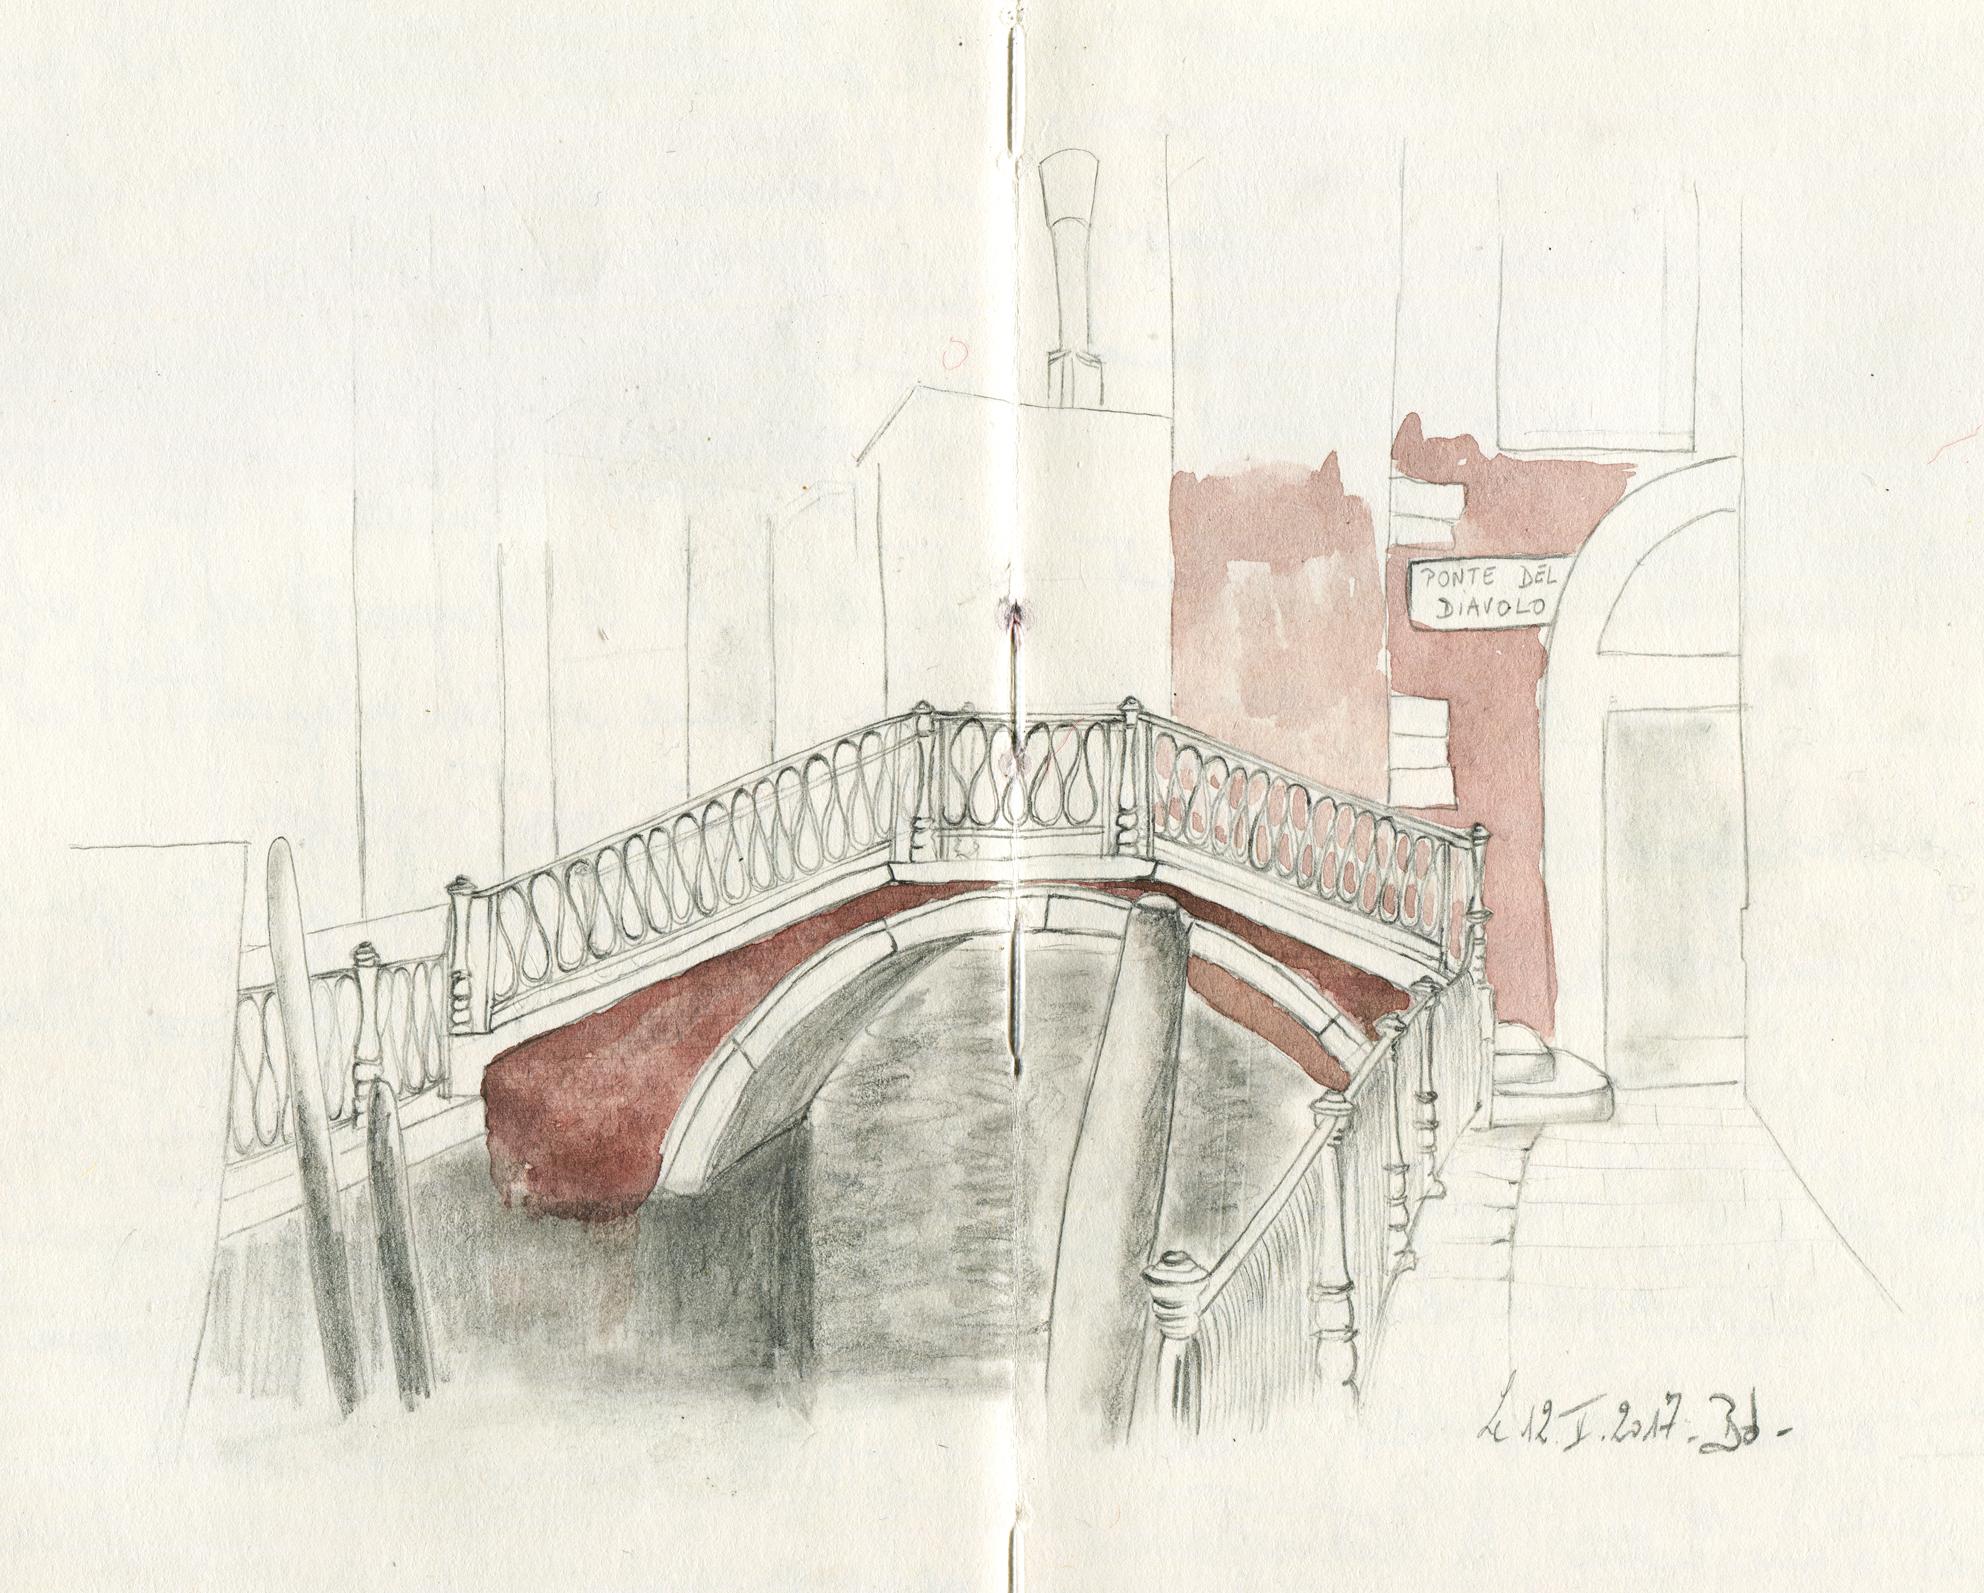 Venise-Castello013-Bdesmettre